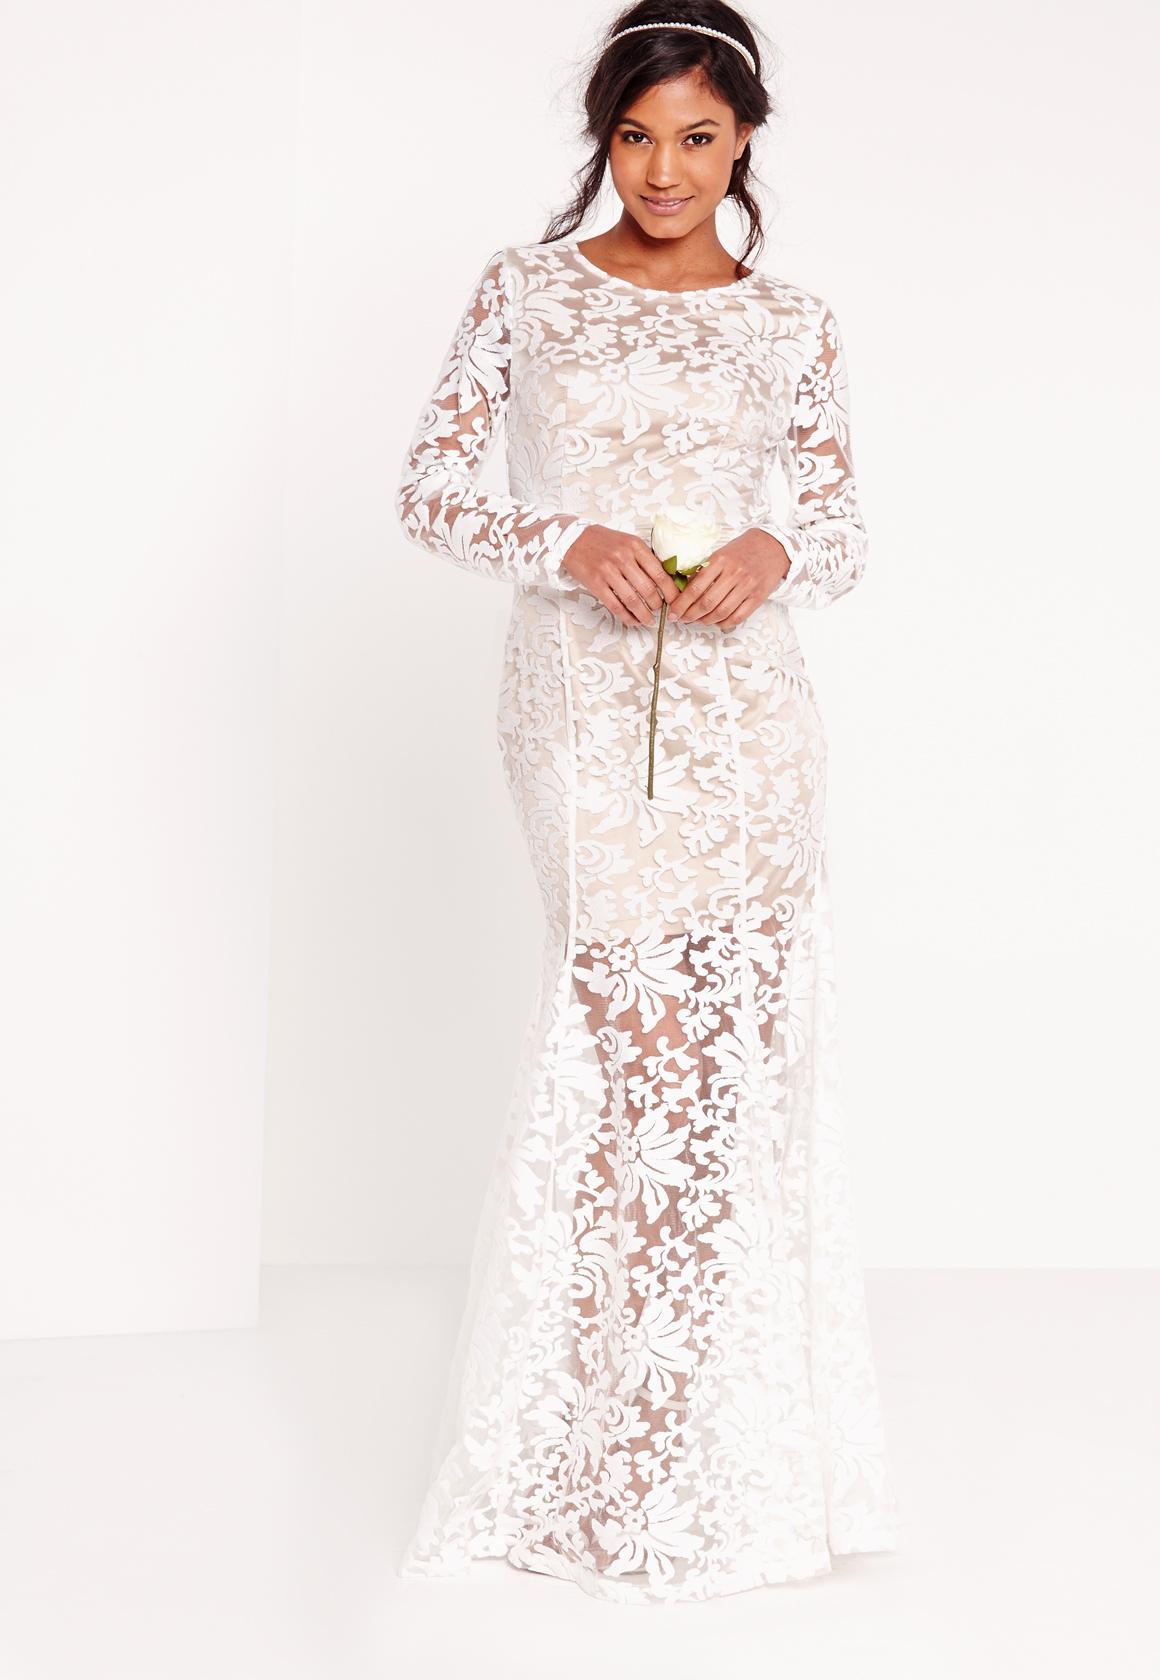 Bridal Lace Open Back Maxi Dress White